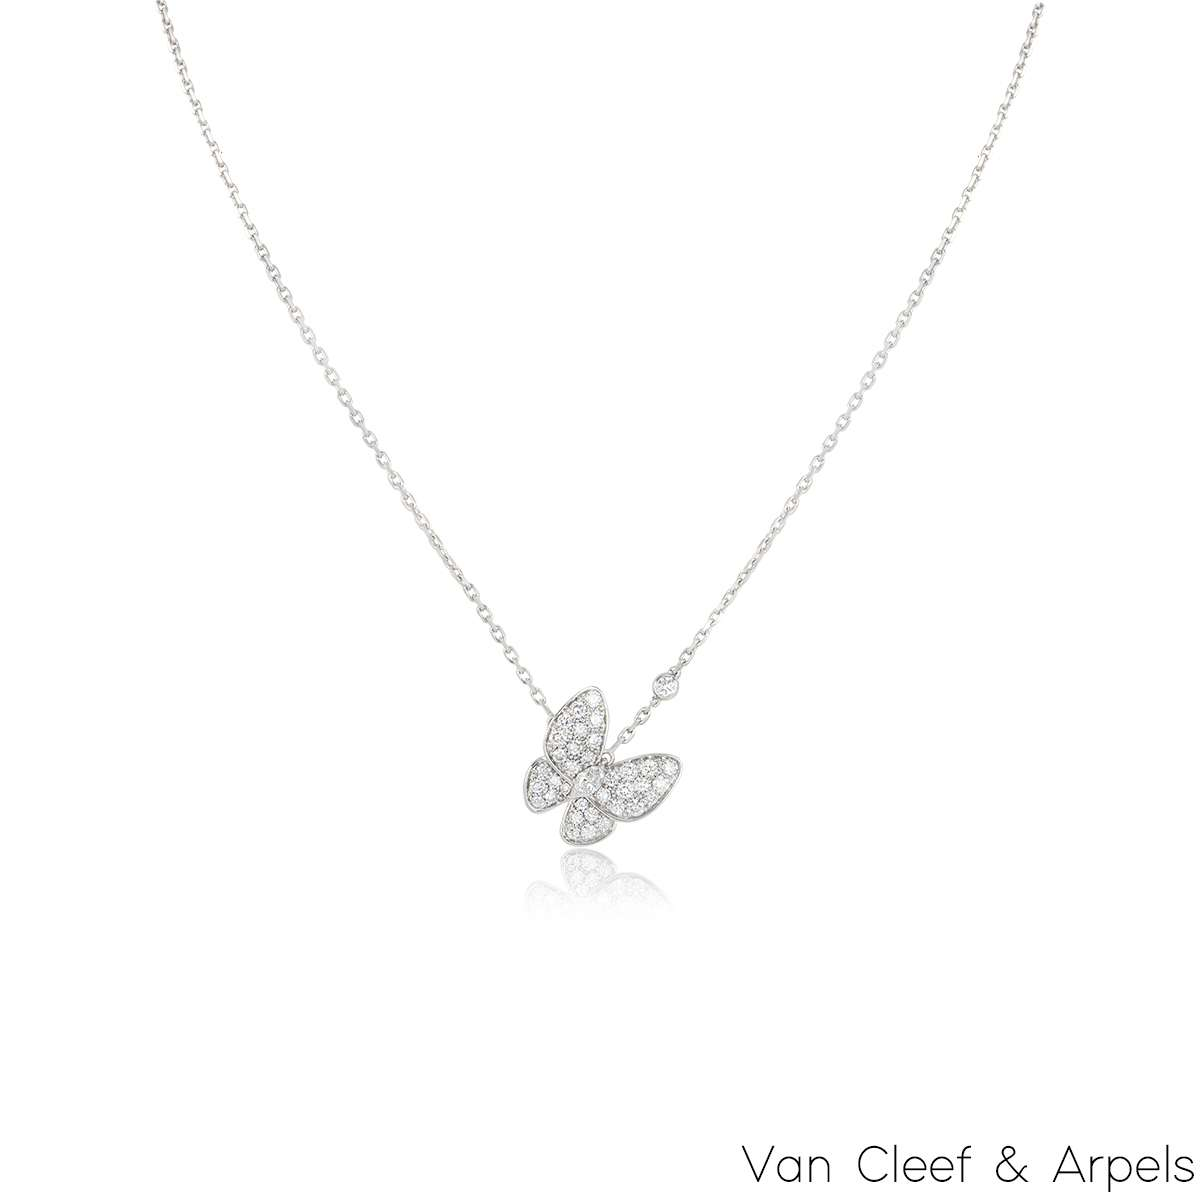 Van Cleef & Arpels Diamond Fauna Pendant VCARO3M400